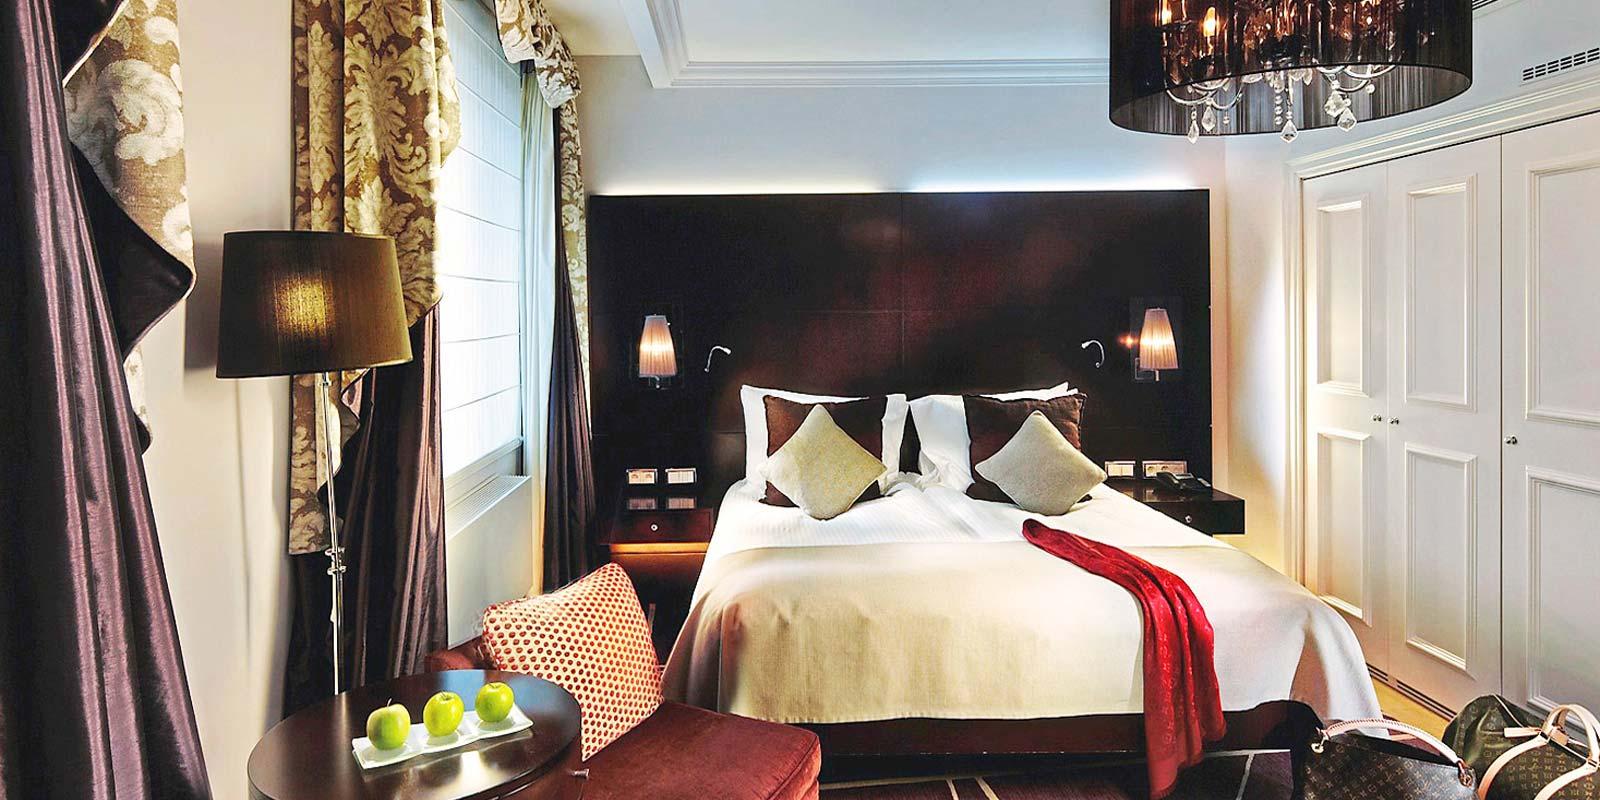 Top 10 Prague hotels | Travel | The Guardian